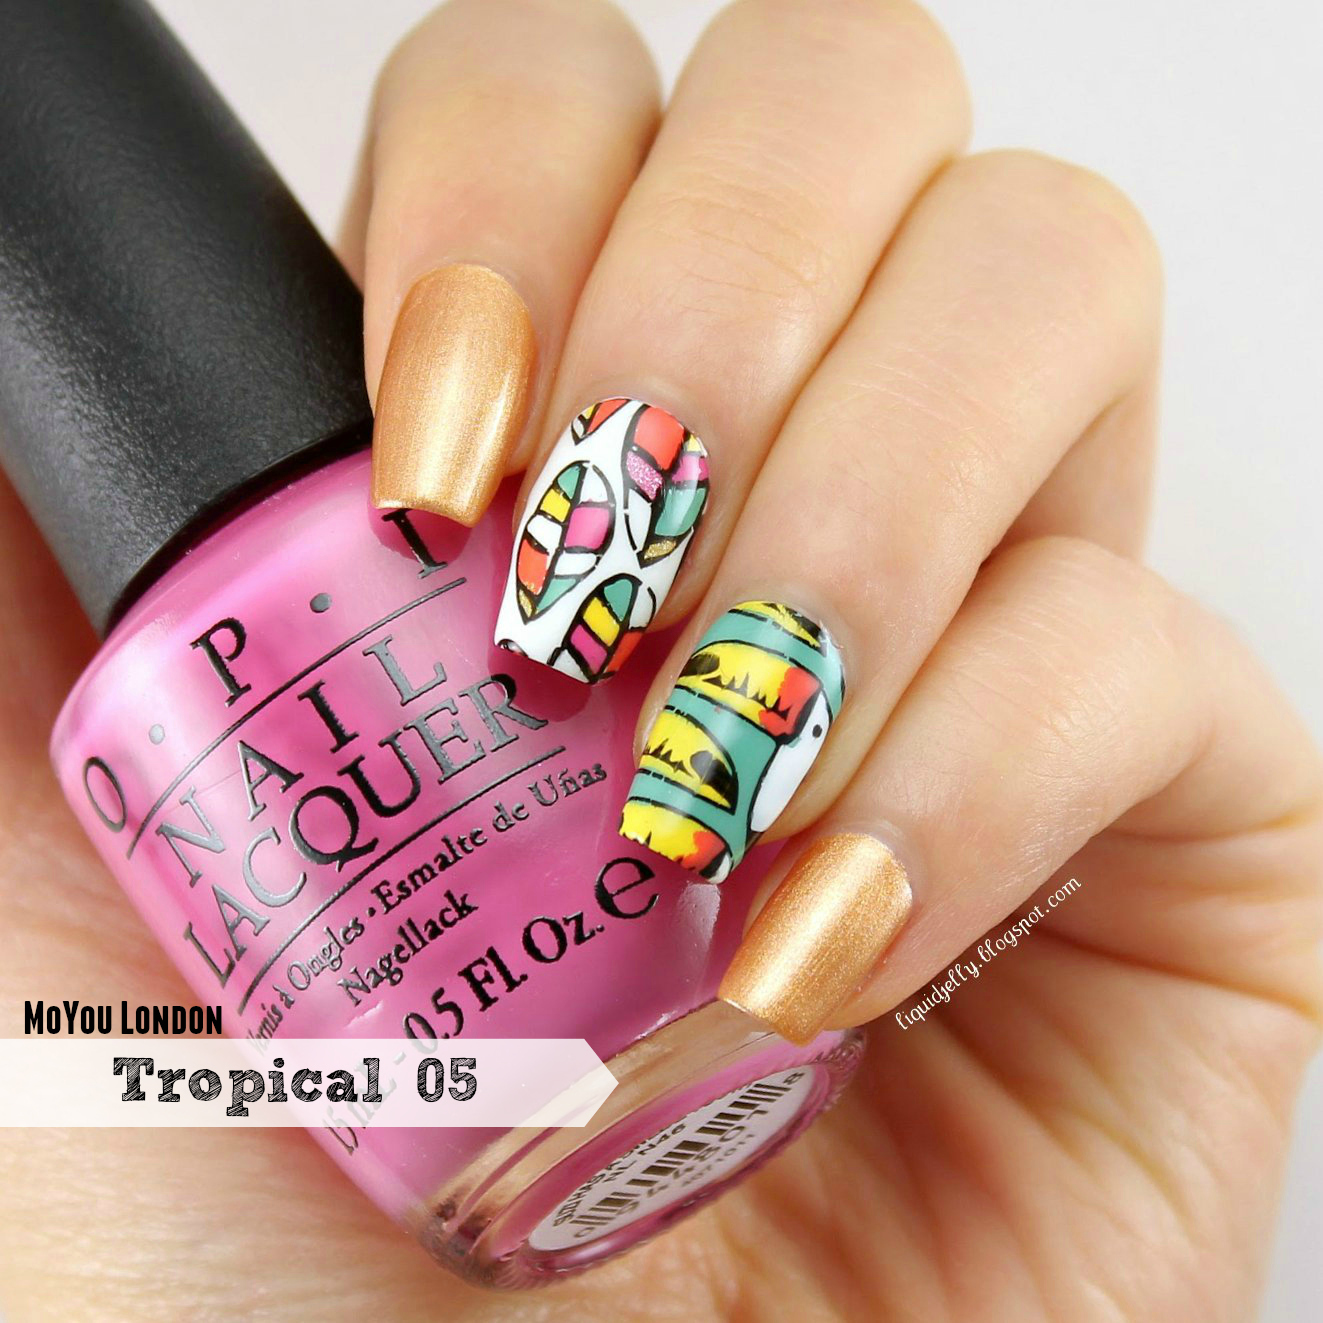 Liquid Jelly: [Nail Art] MoYou London Tropical 05